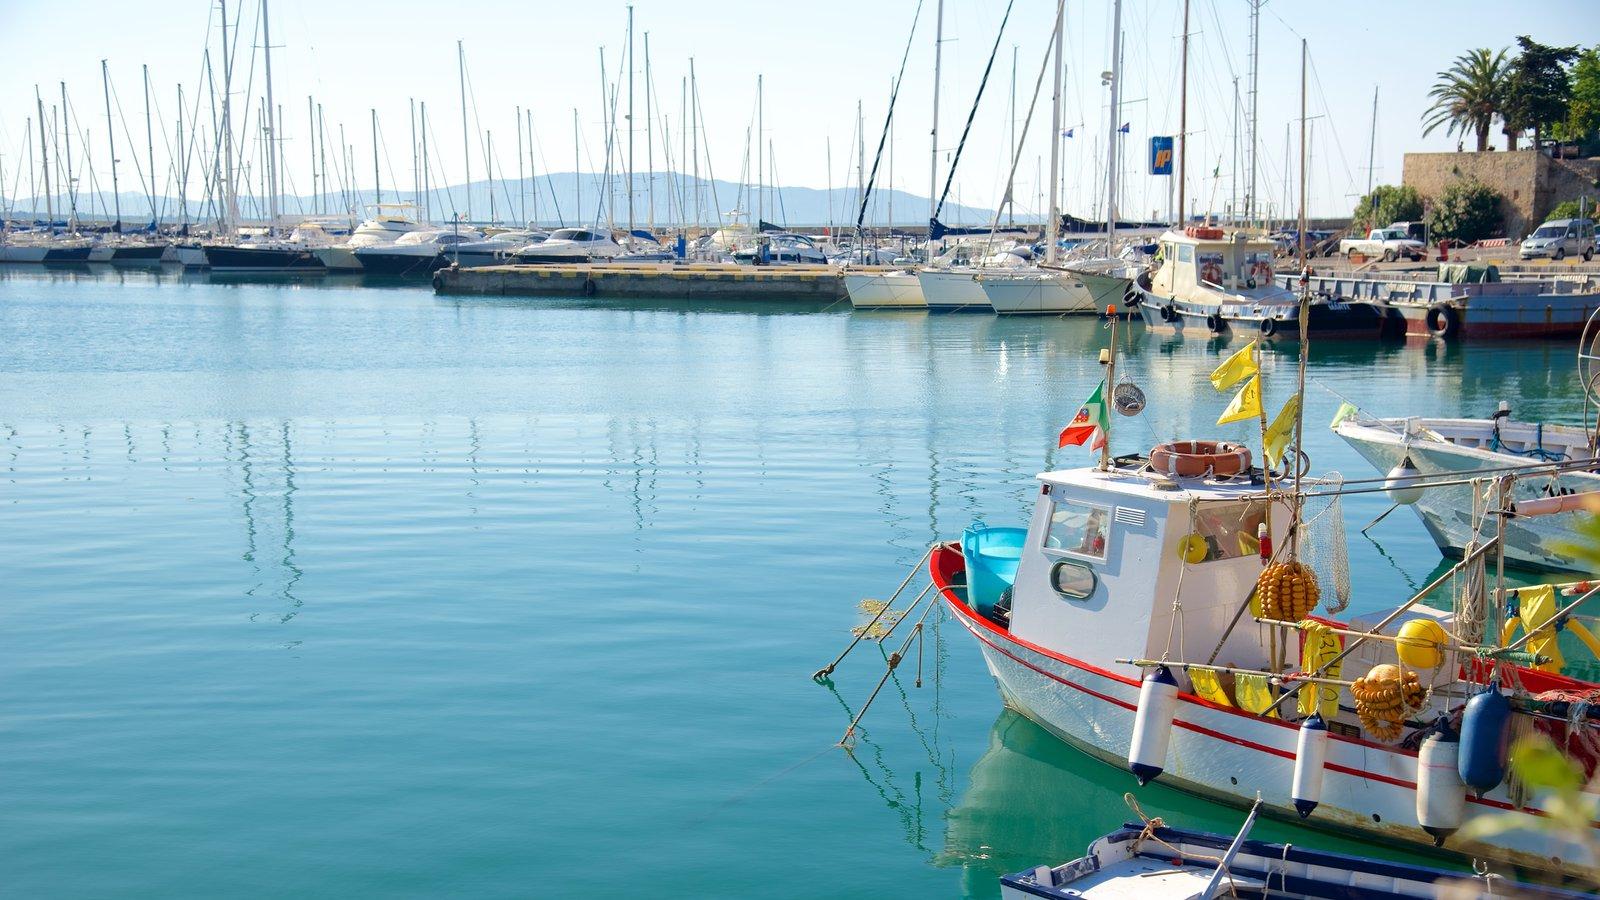 Talamone que inclui uma marina e canoagem